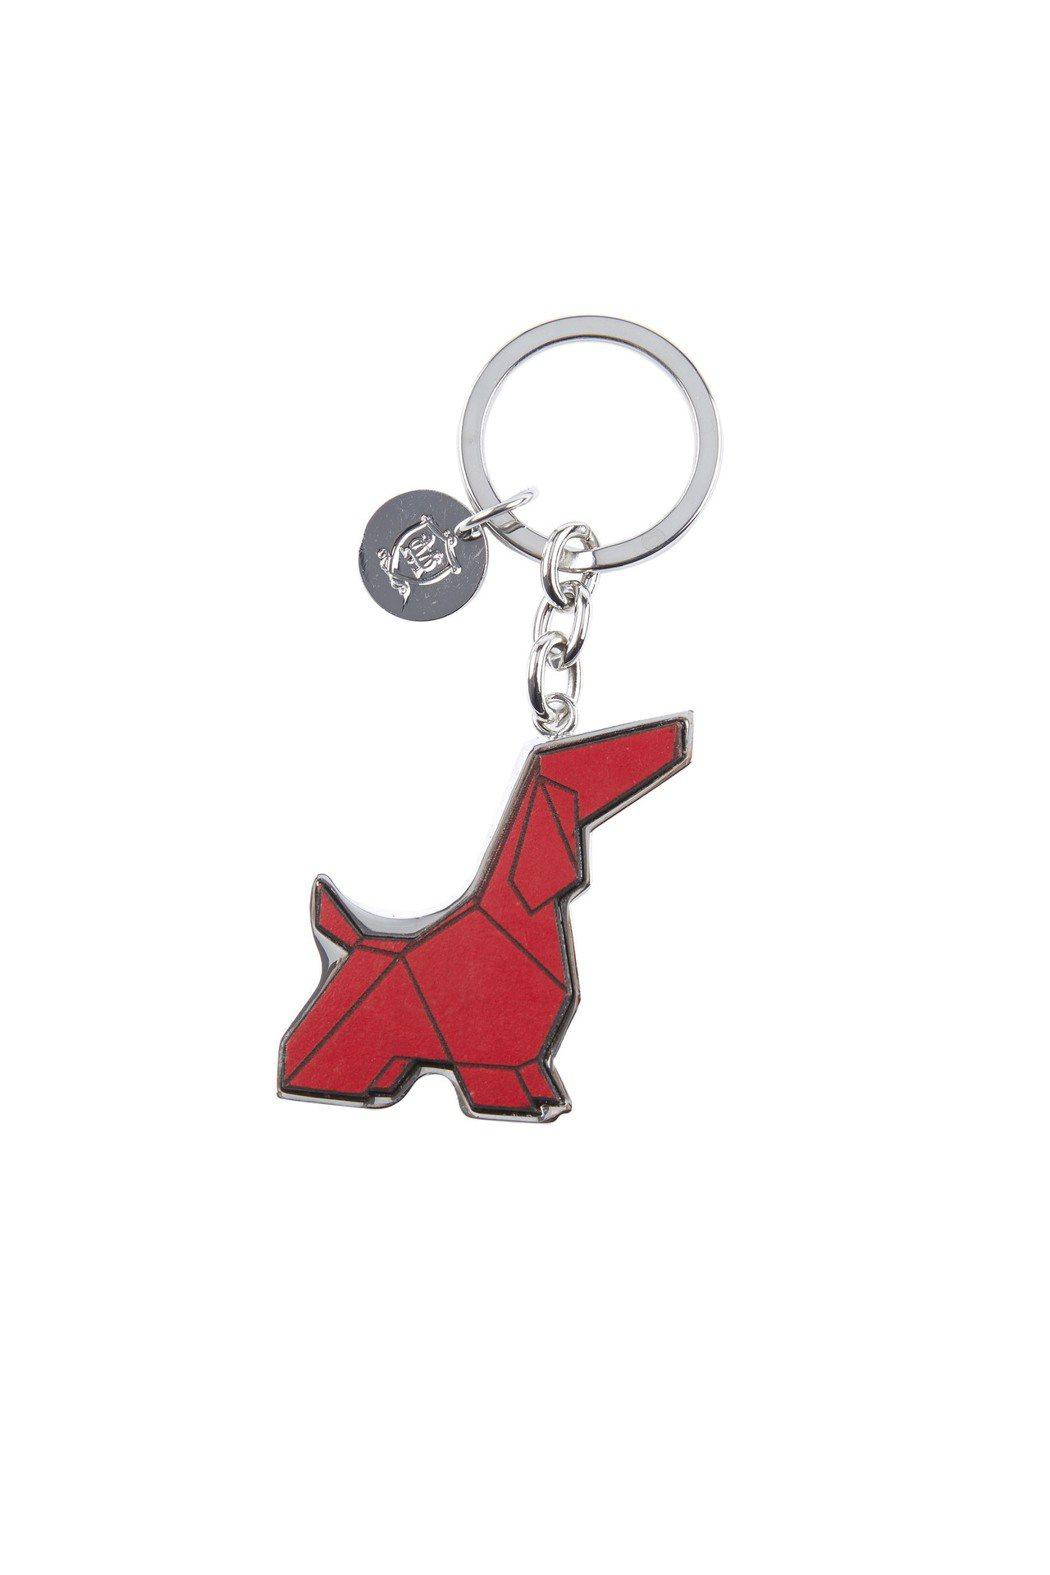 Massimo Dutti生肖鑰匙圈990元。圖/Massimo Dutti提供